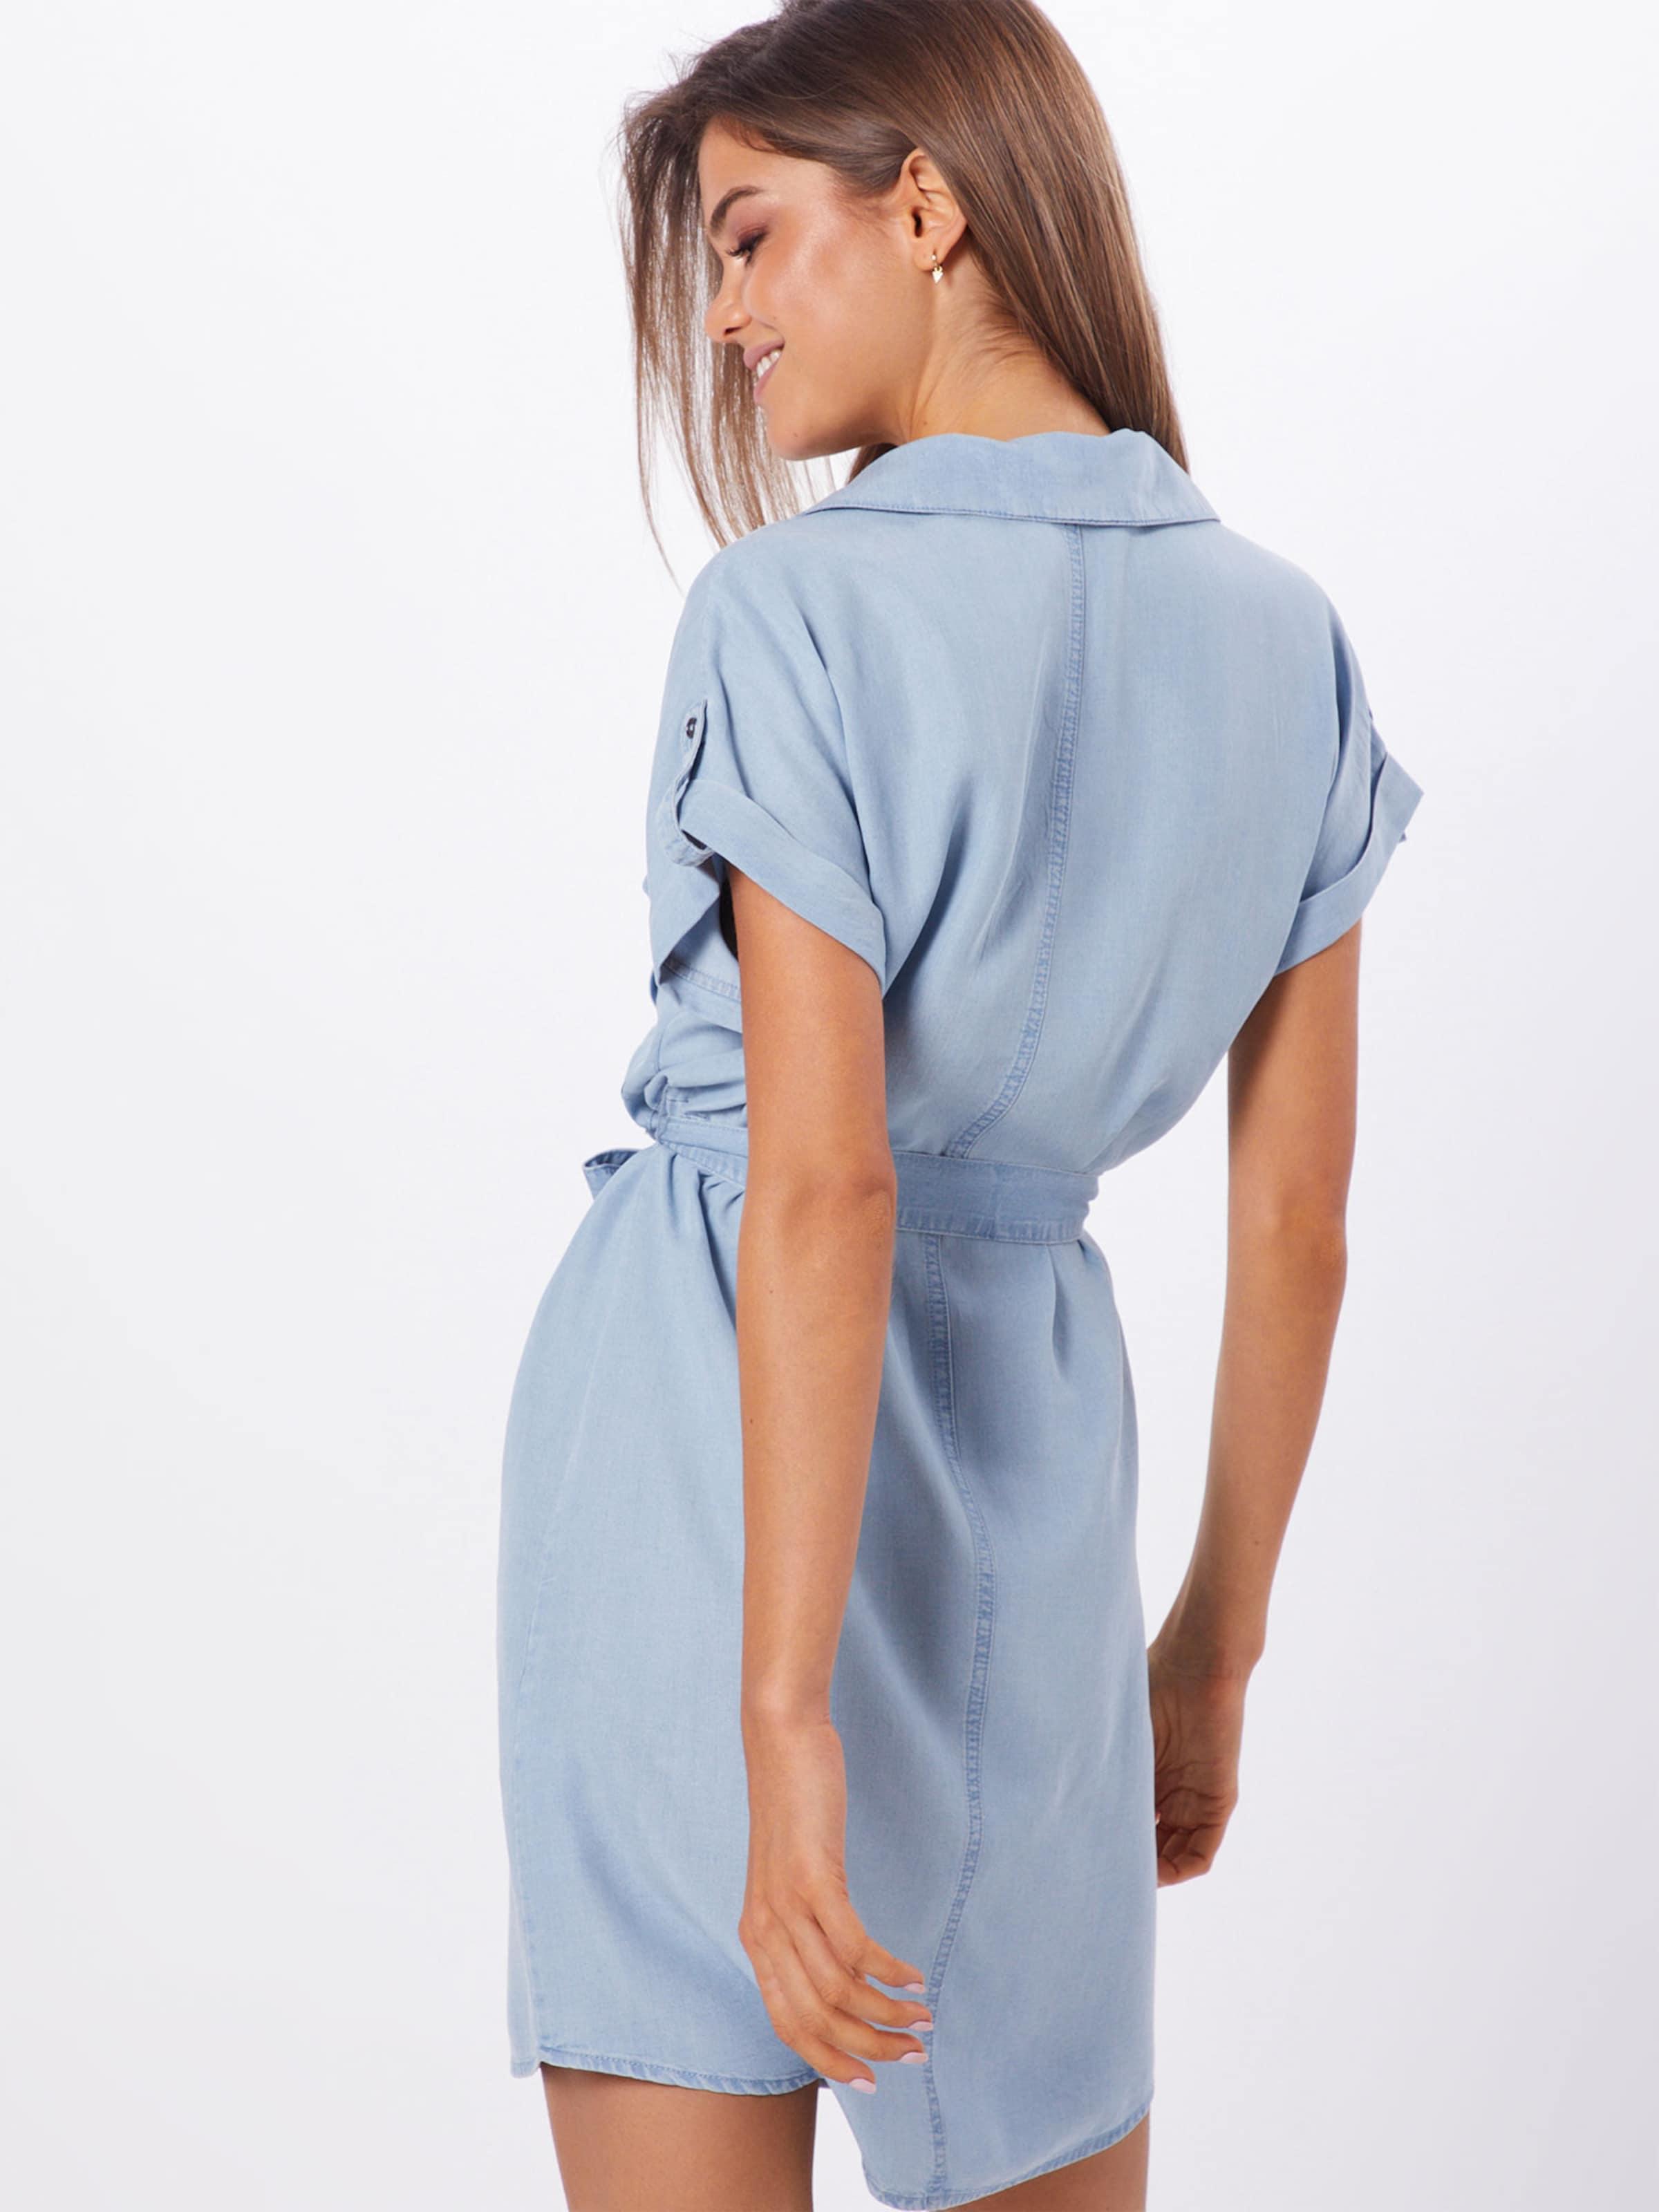 chemise Denim Noisy May s En S Bleu Robe Endi' 'nmvera uXZPki